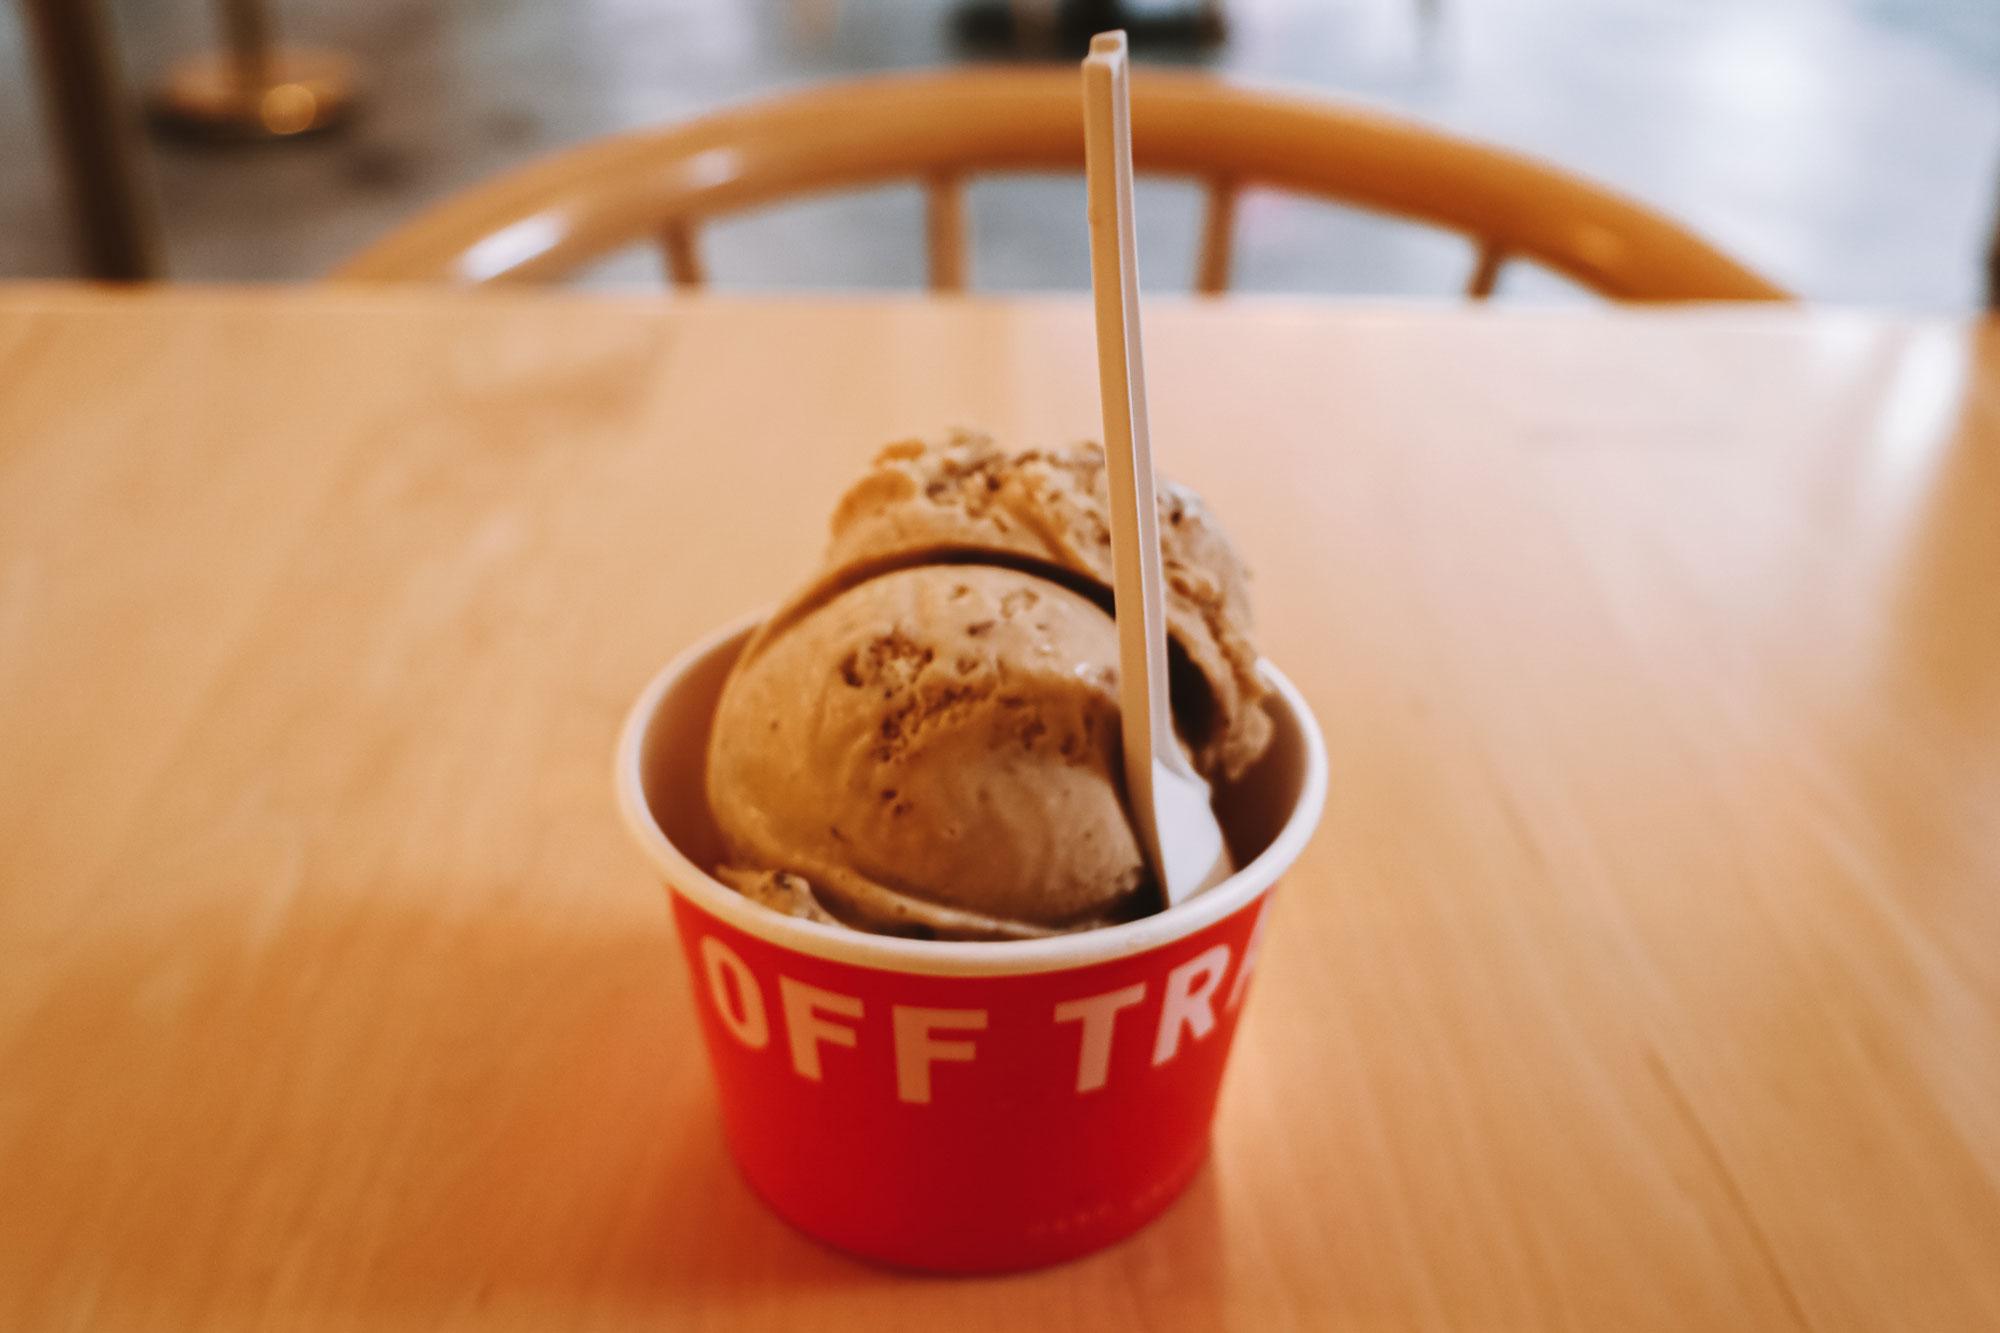 Ice cream from Off Track Ice Cream.